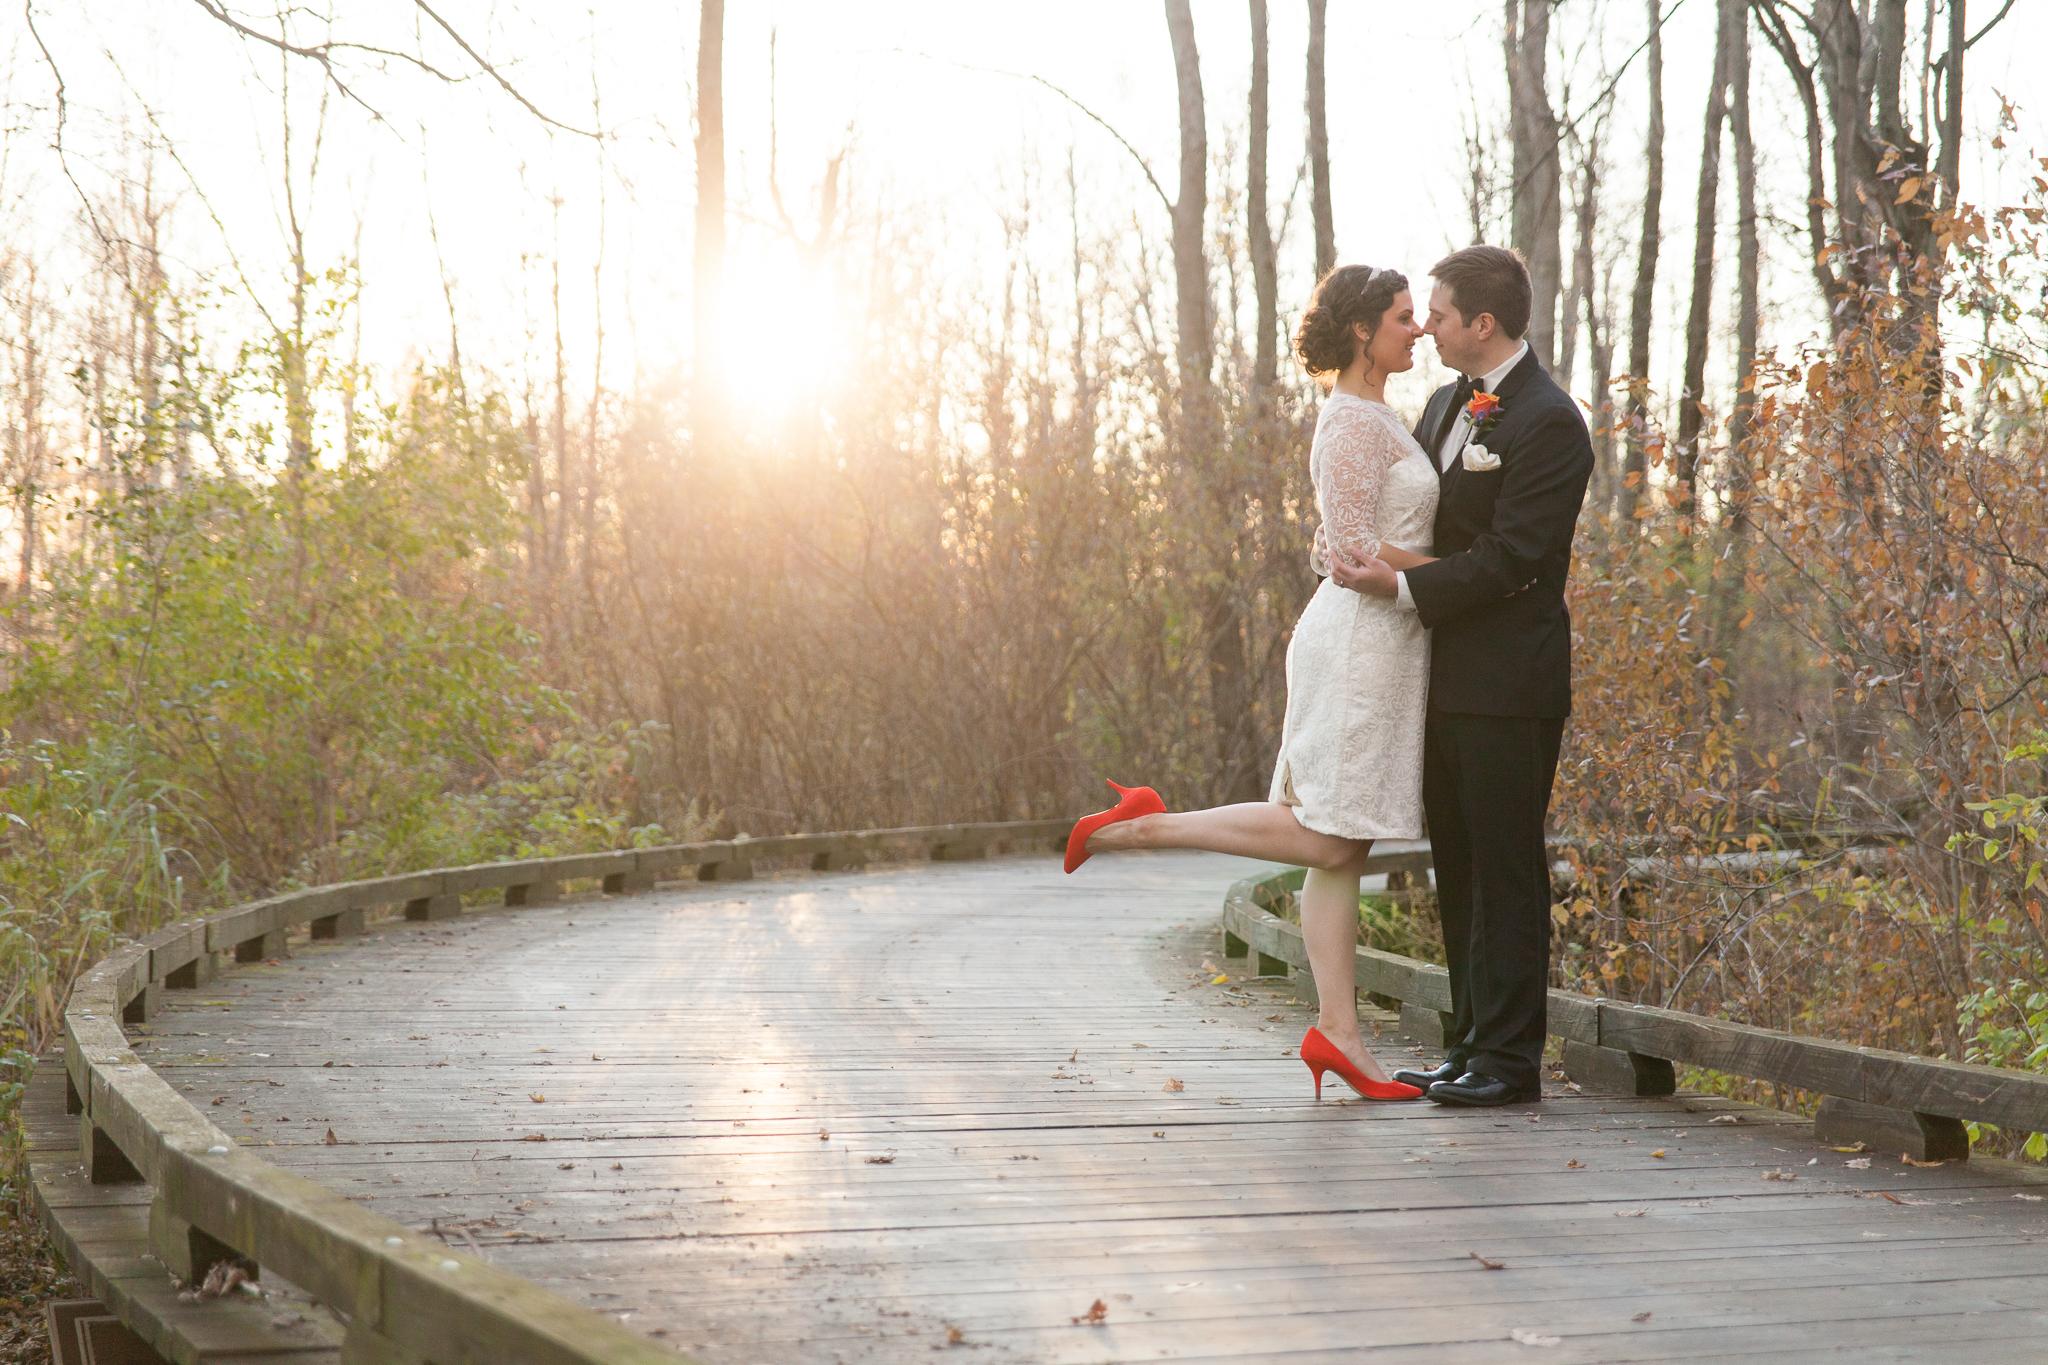 camuglia-whomstudio-chelsea_and_andy-nycphotographer-wedding-brooklyn-buffalo-timberlodge-058-0467.jpg